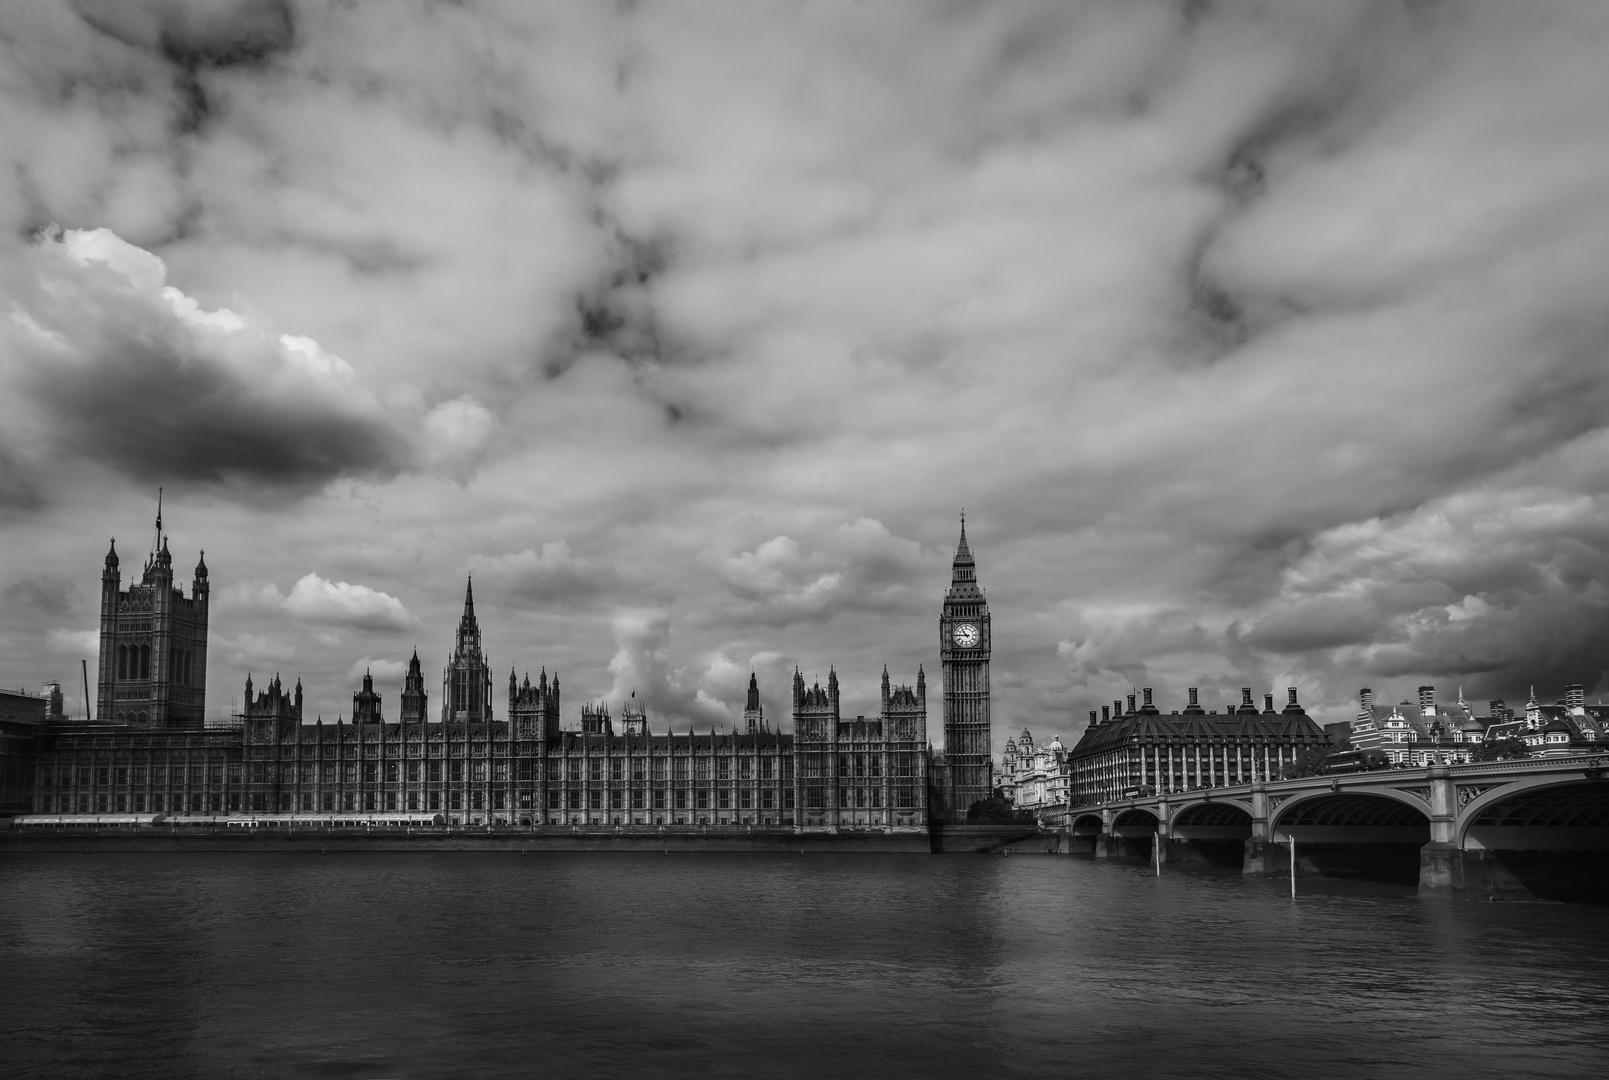 Westminster palace et Big Ben